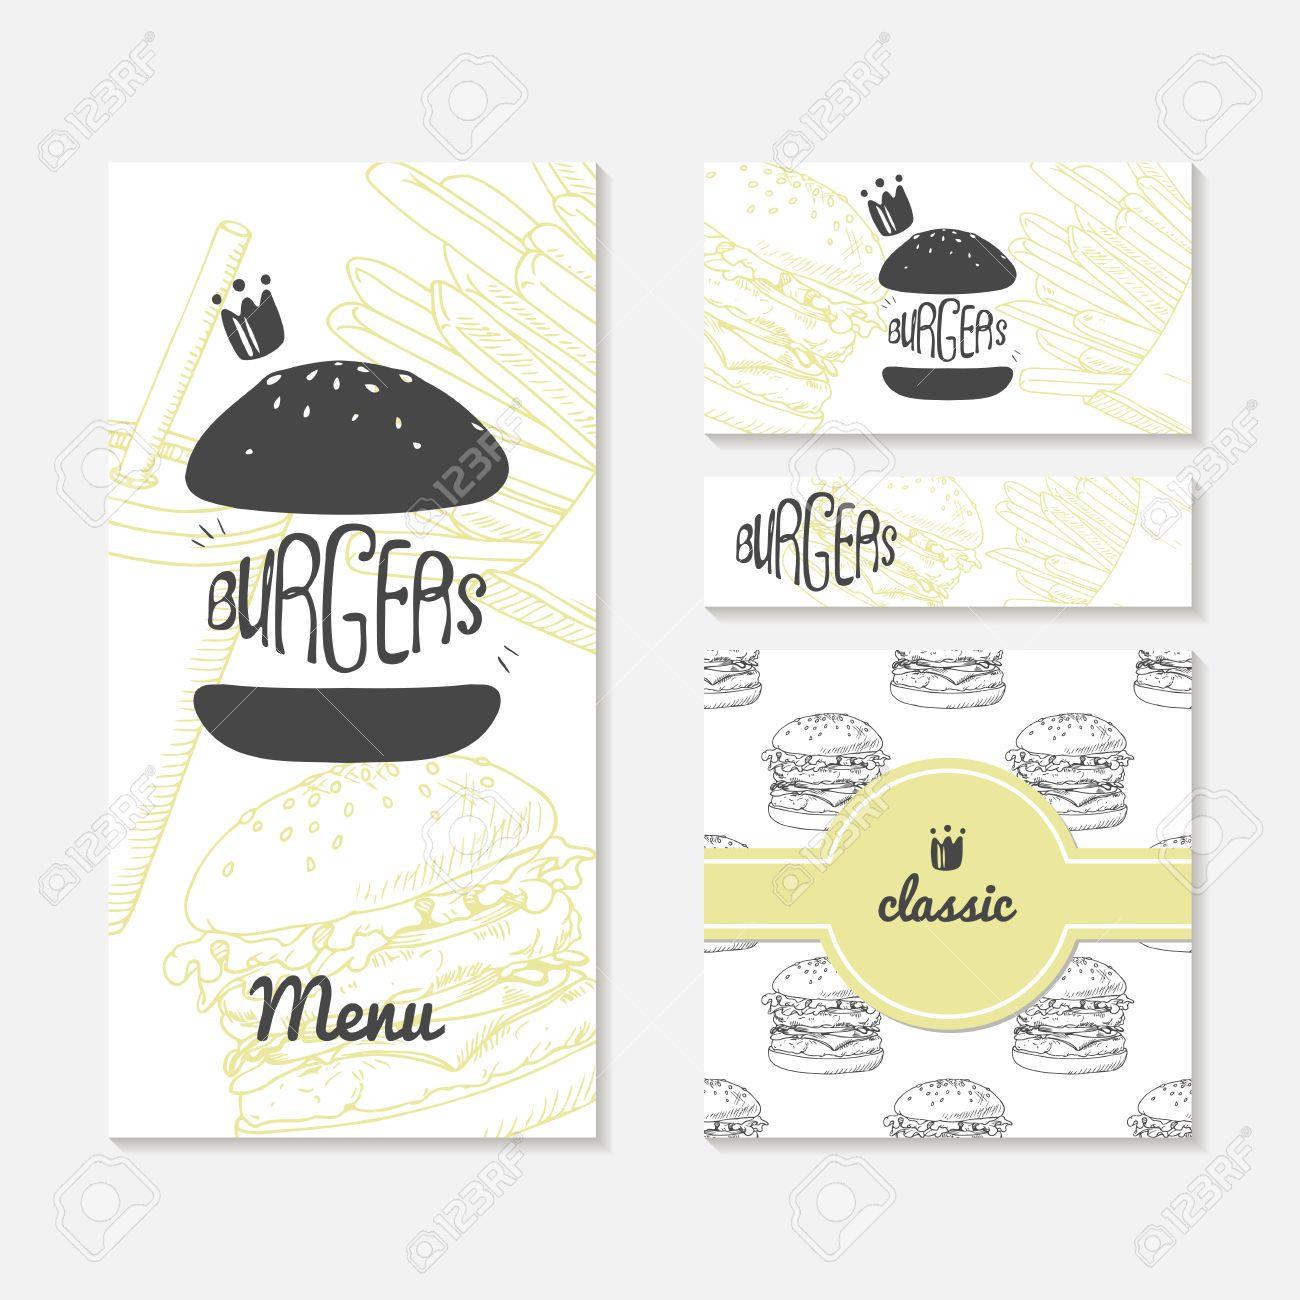 Set Of Cards With Sketched Burger. Fast Food Restaurant Branding ...